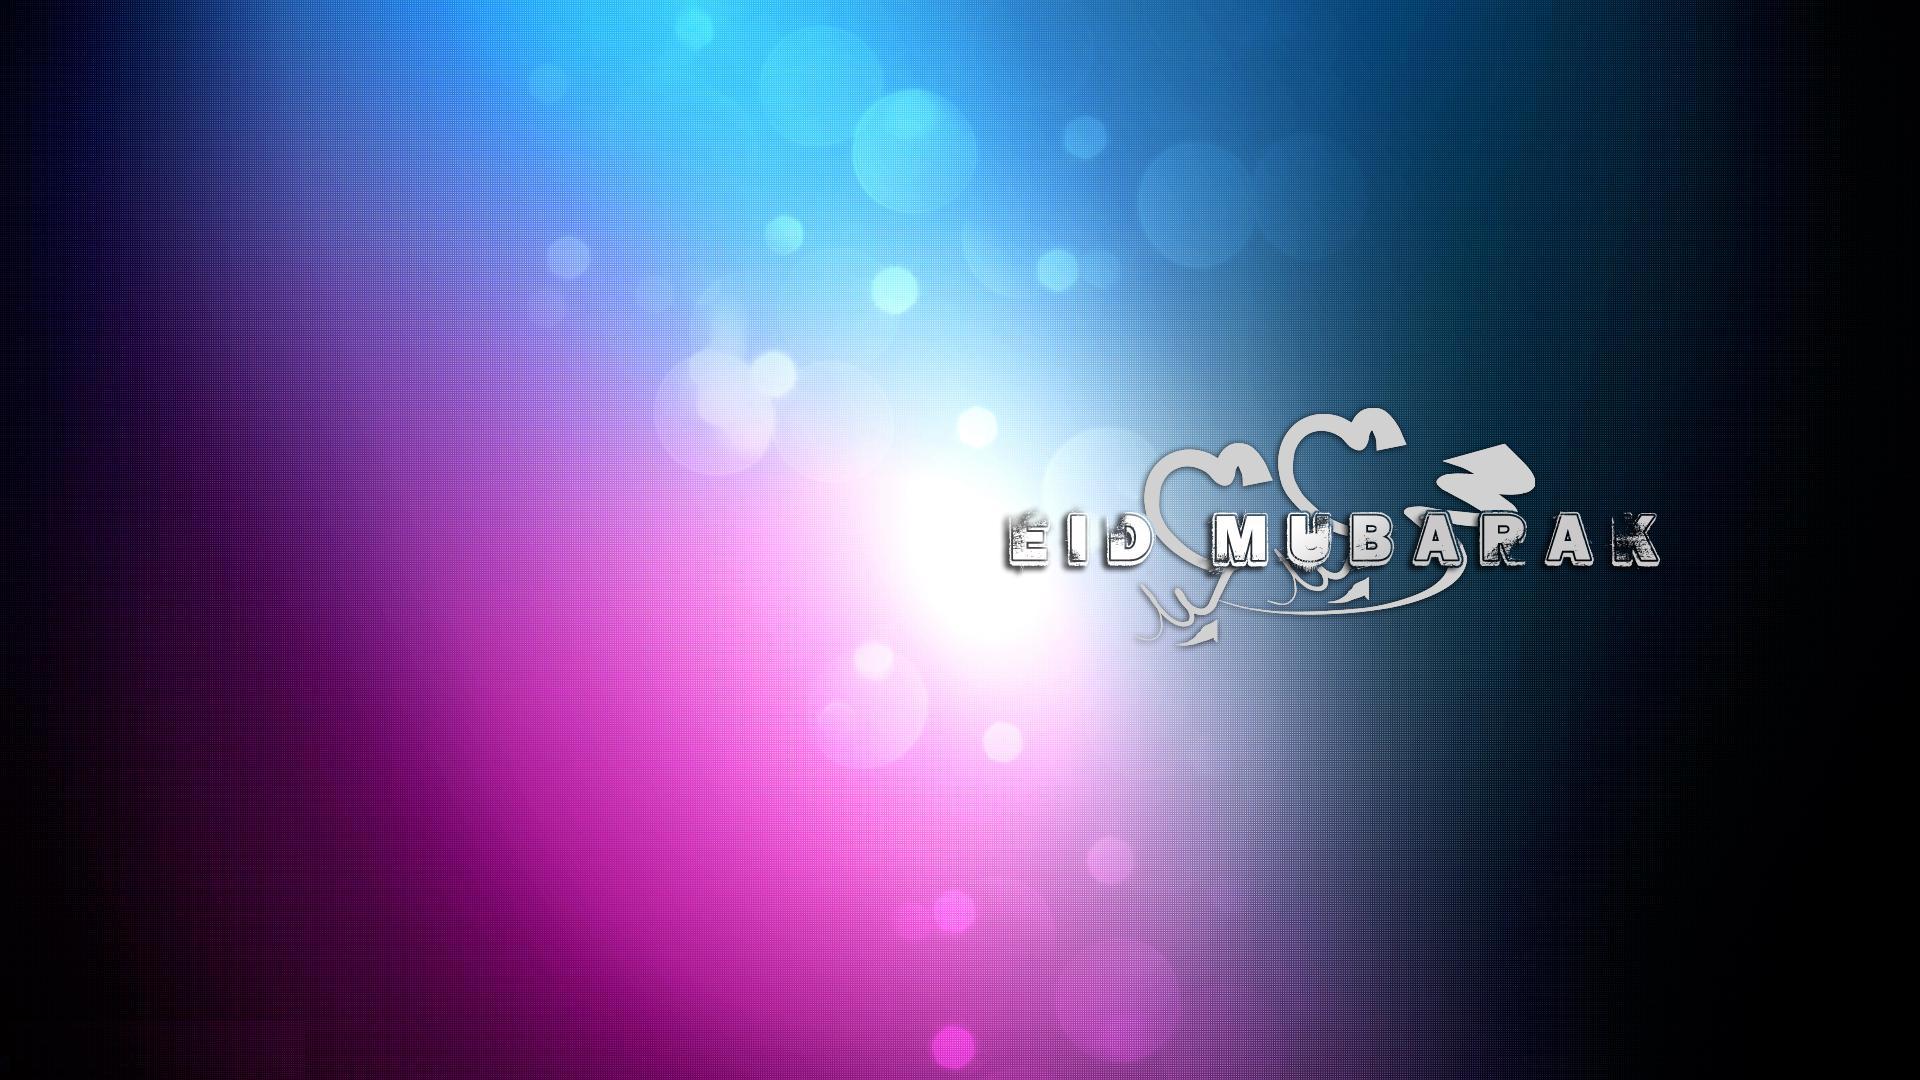 Happy Eid eid greetings